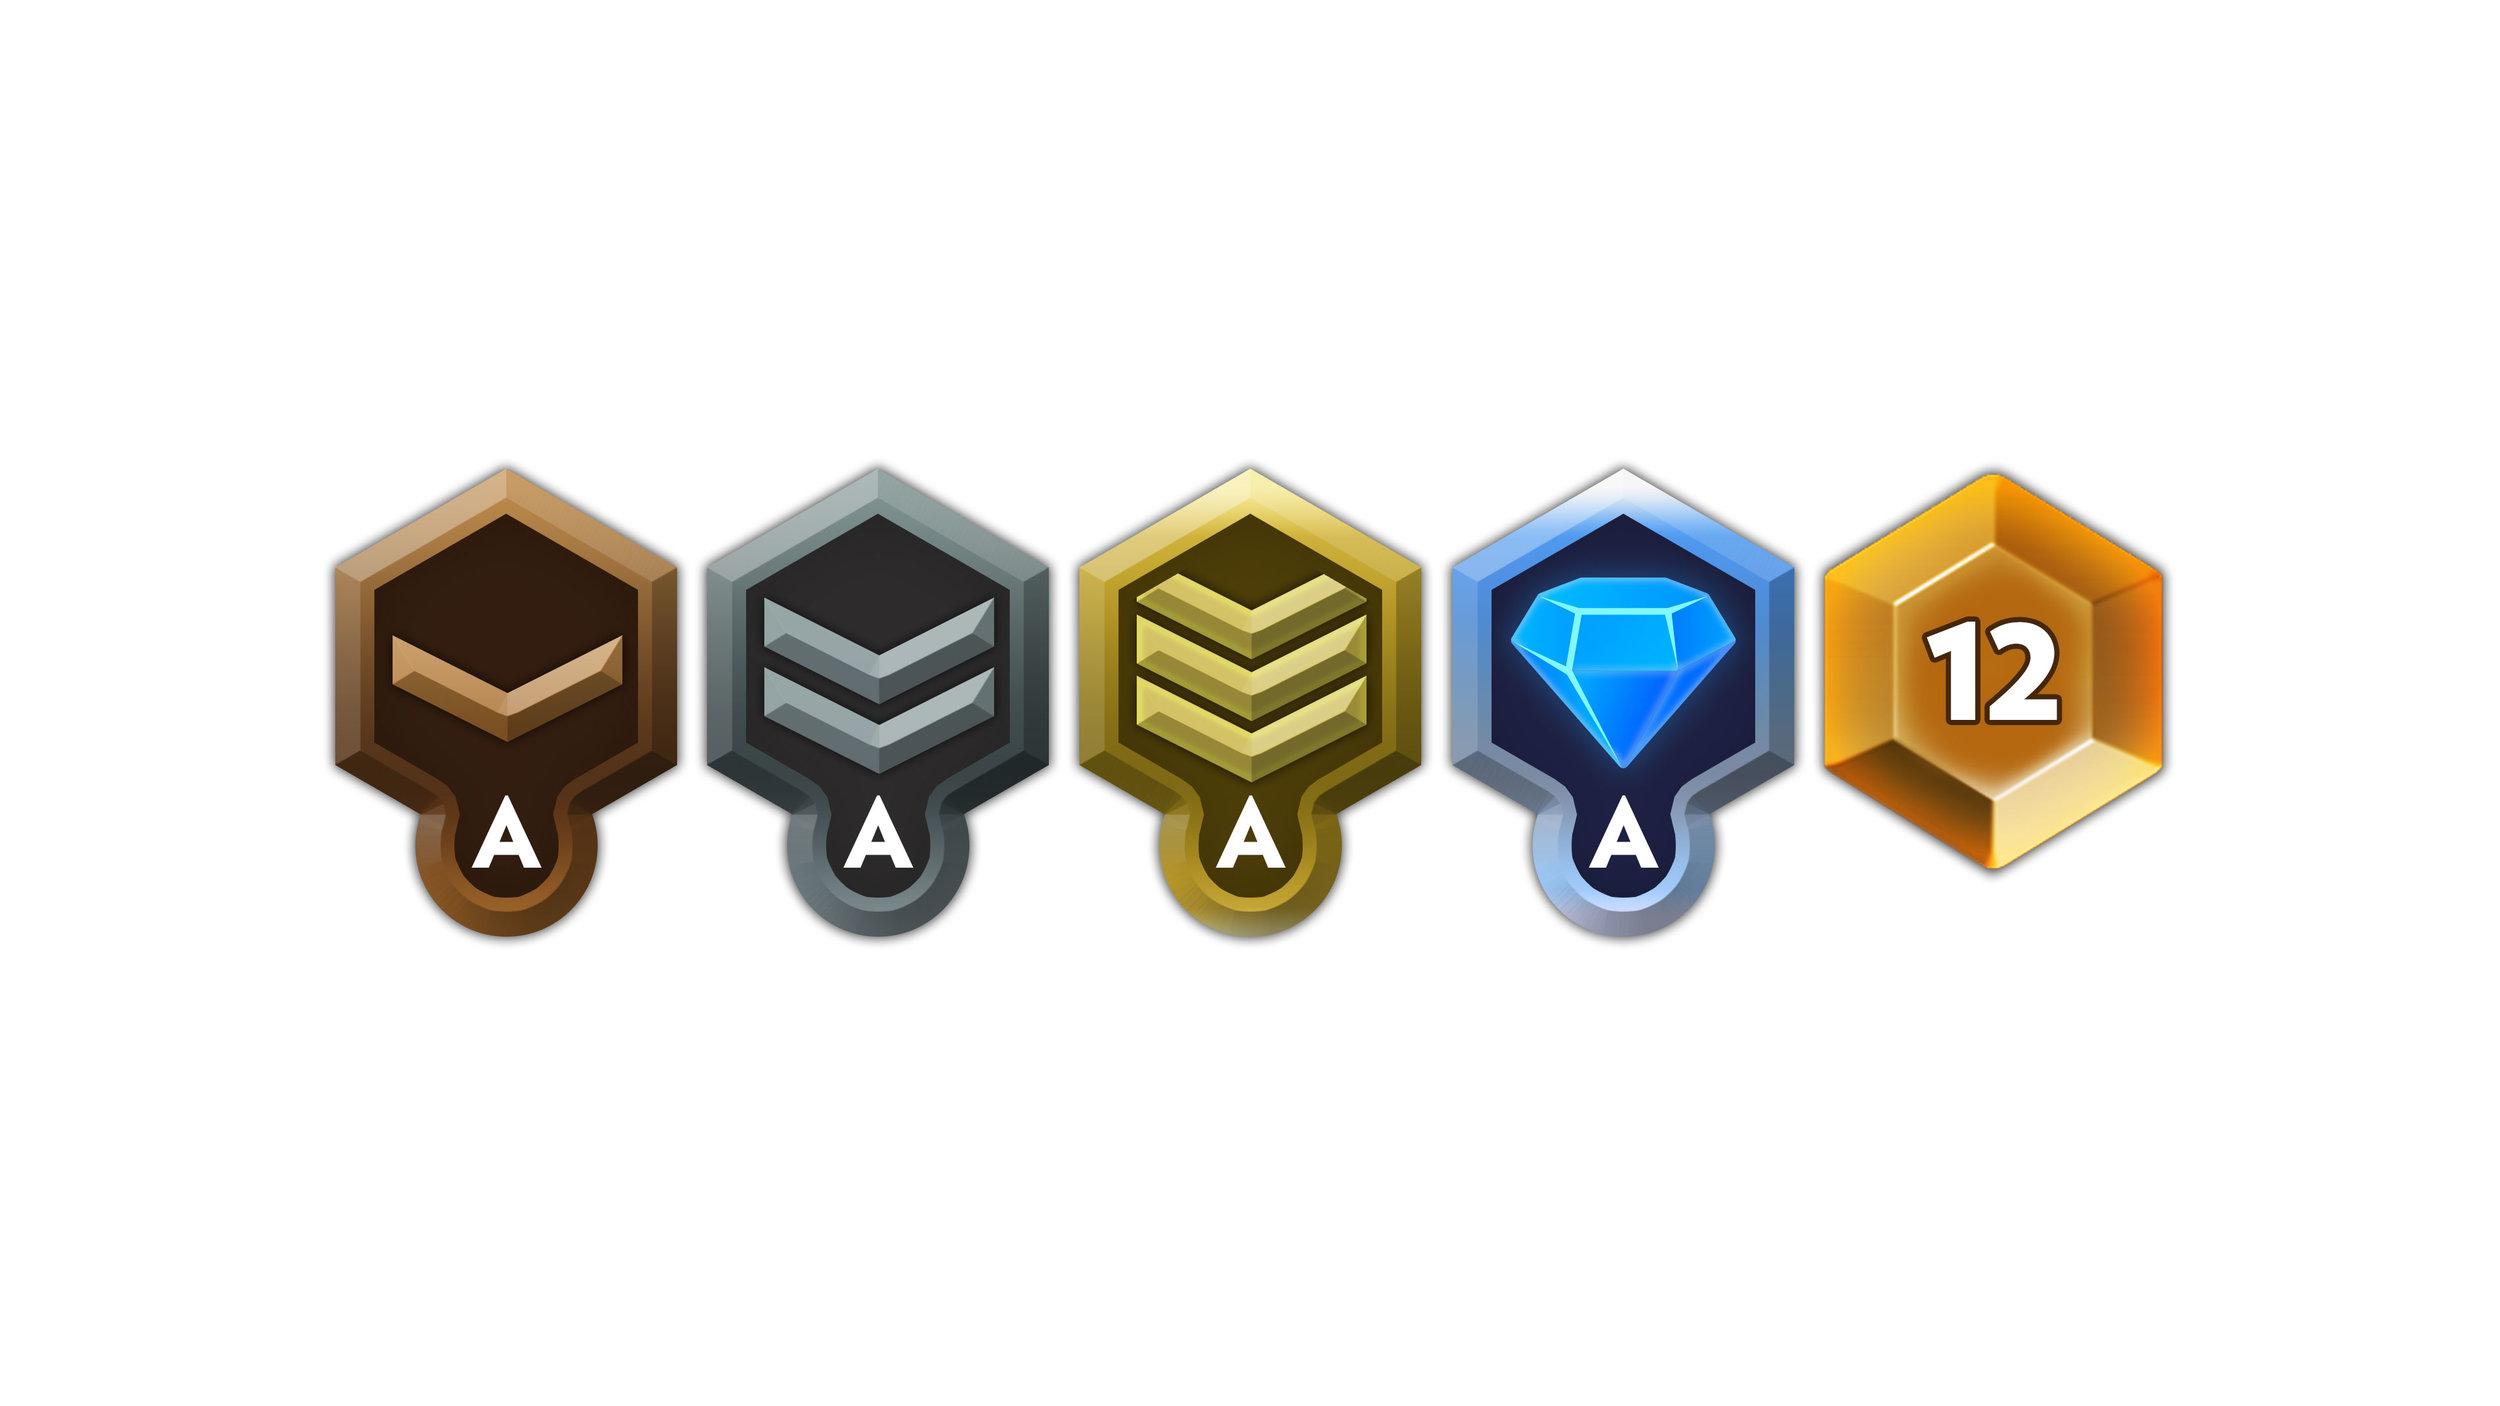 rank_icons_layout3.jpg